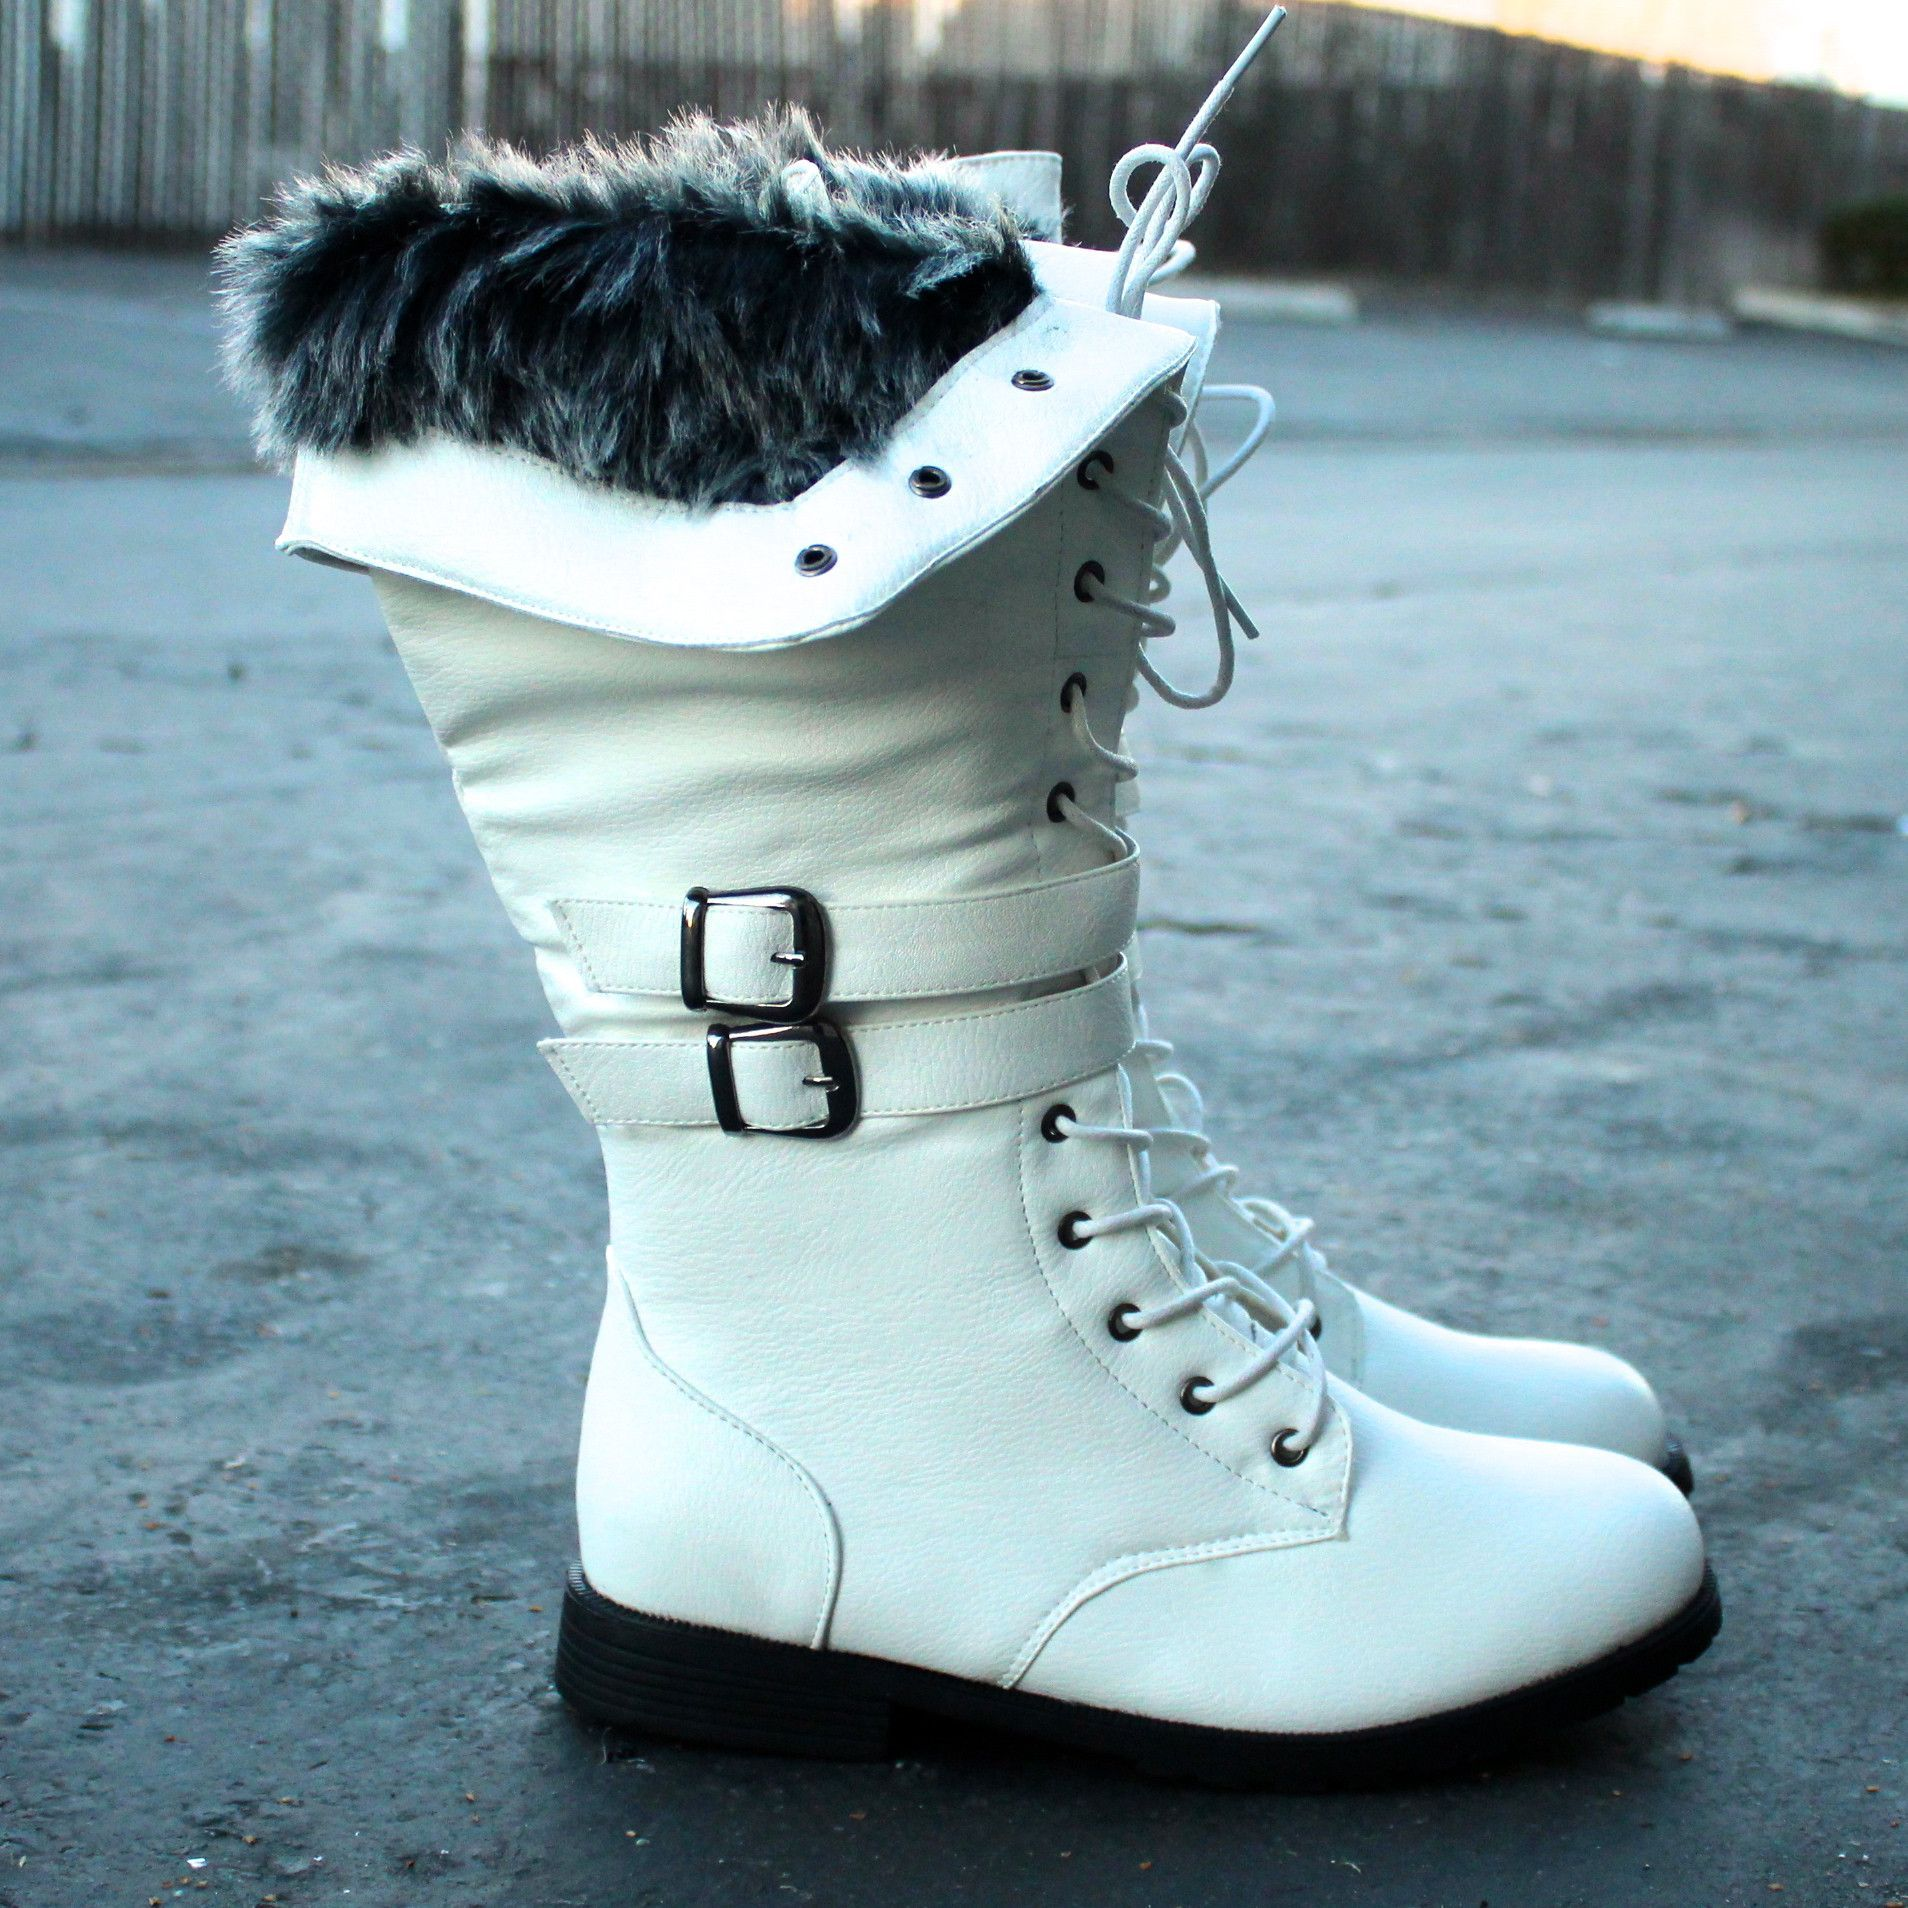 white wonderland boots with fur shophearts Boots, Fur